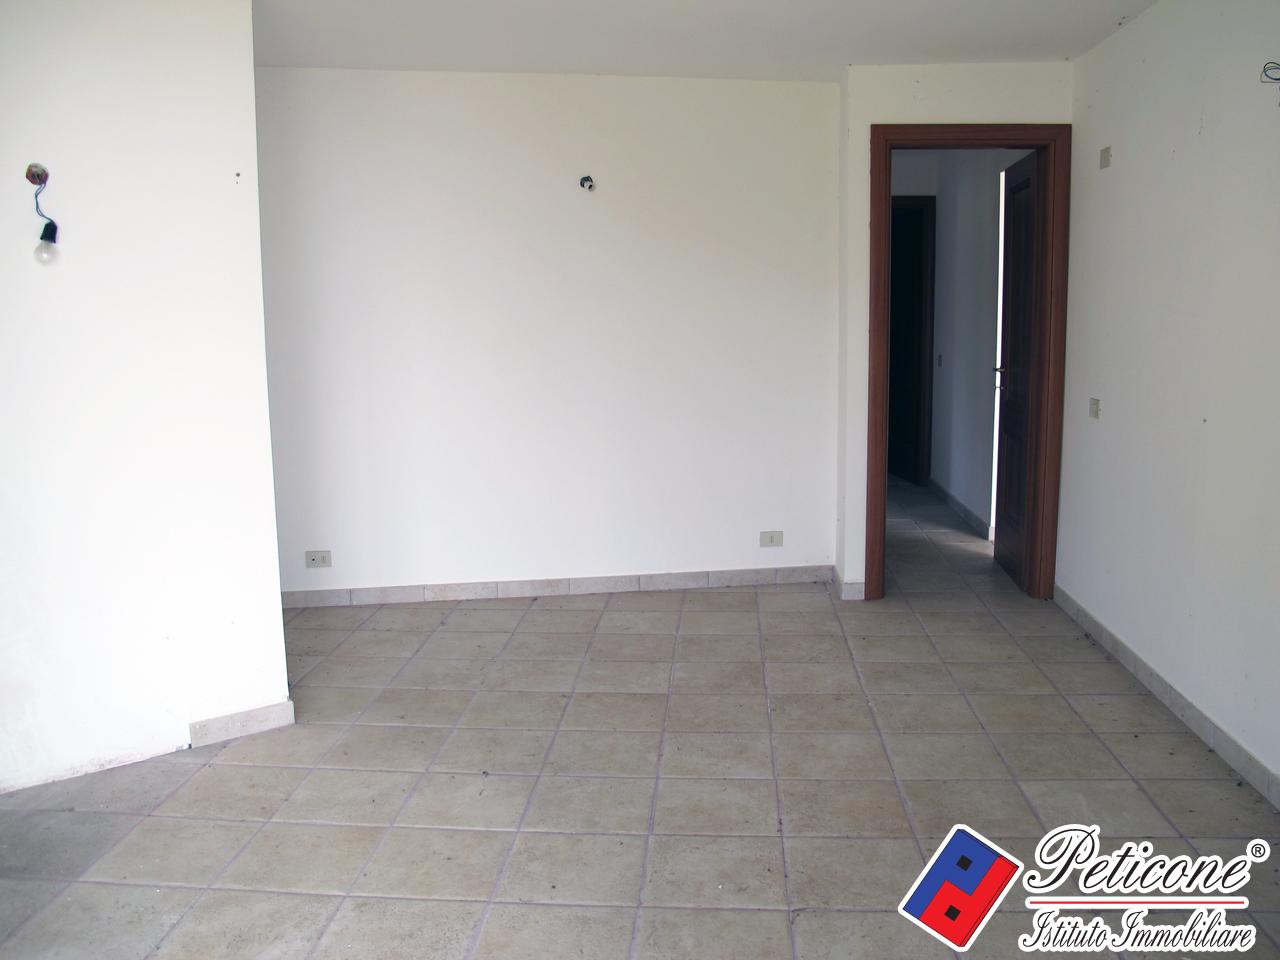 Appartamento in Vendita a Sperlonga: 1 locali, 45 mq - Foto 5